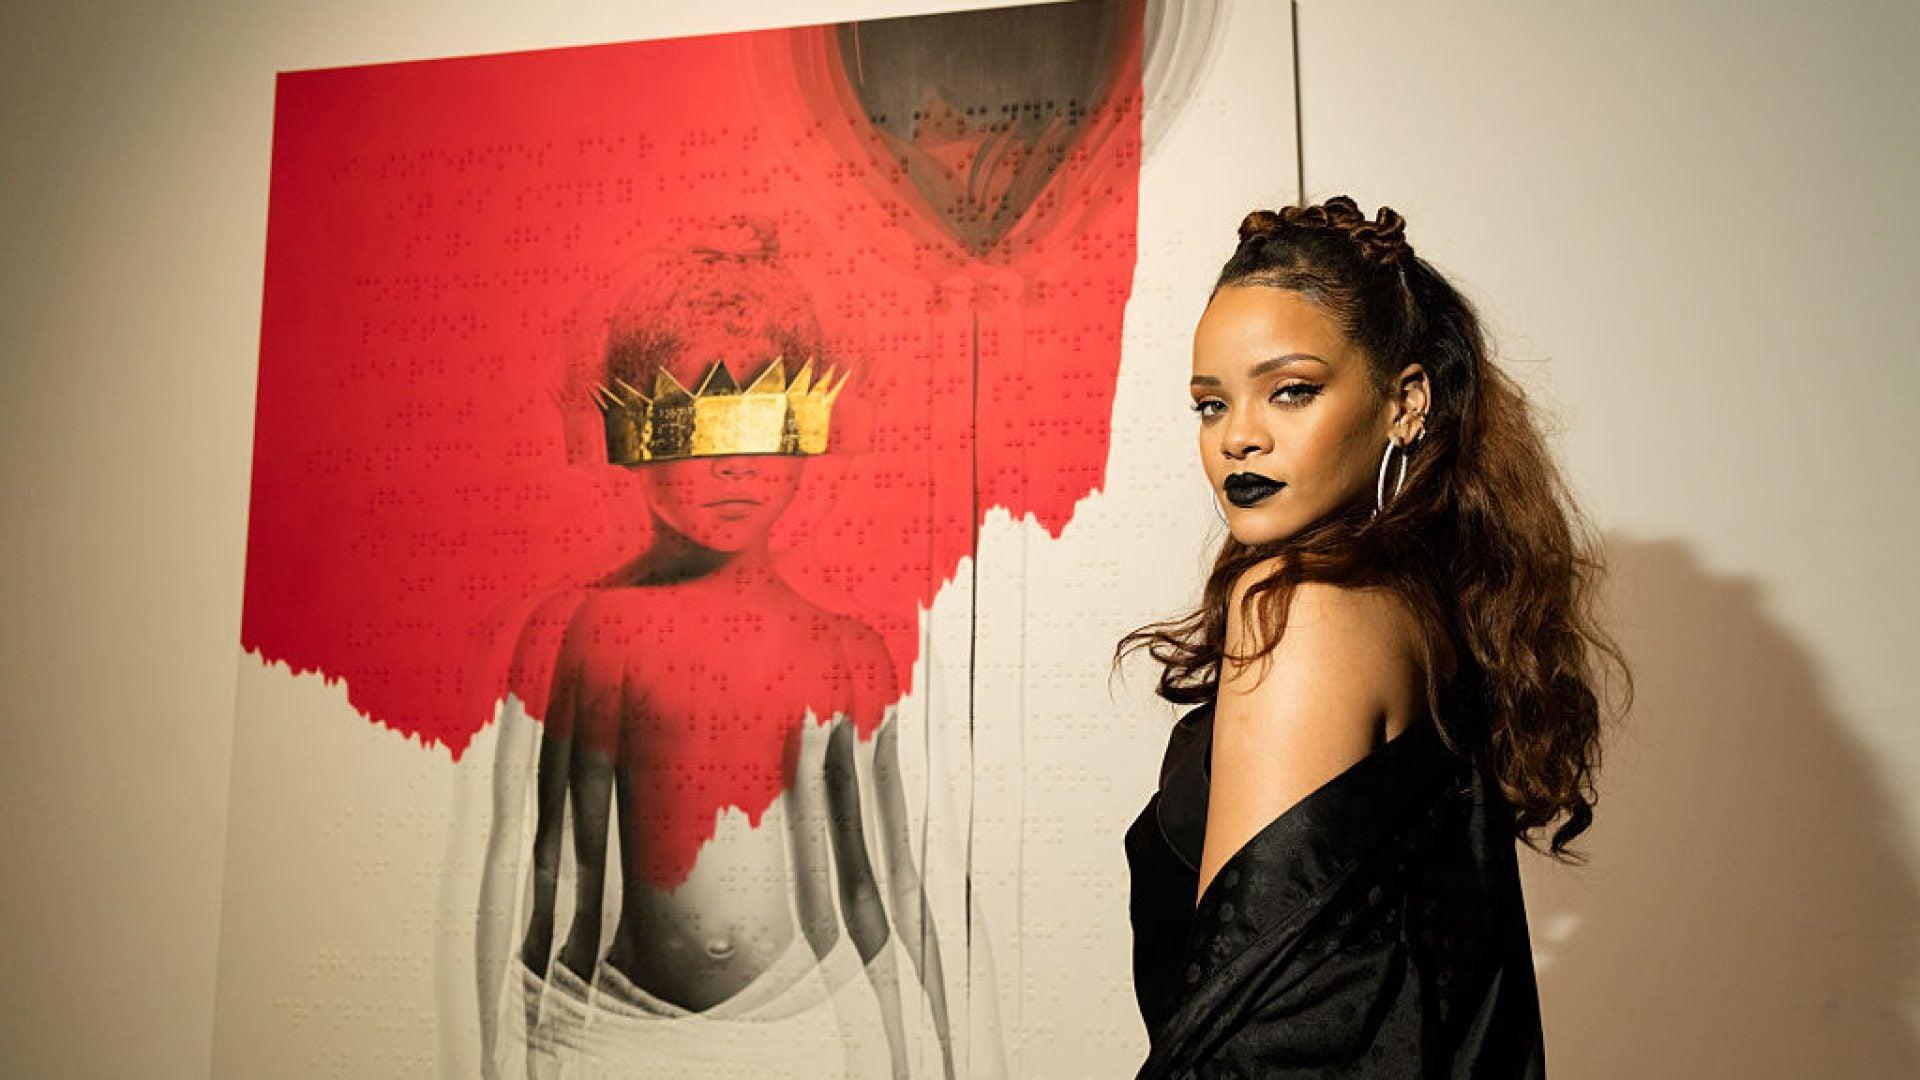 5 Years Since ANTI: Rihanna's Move From Music Into Mogul